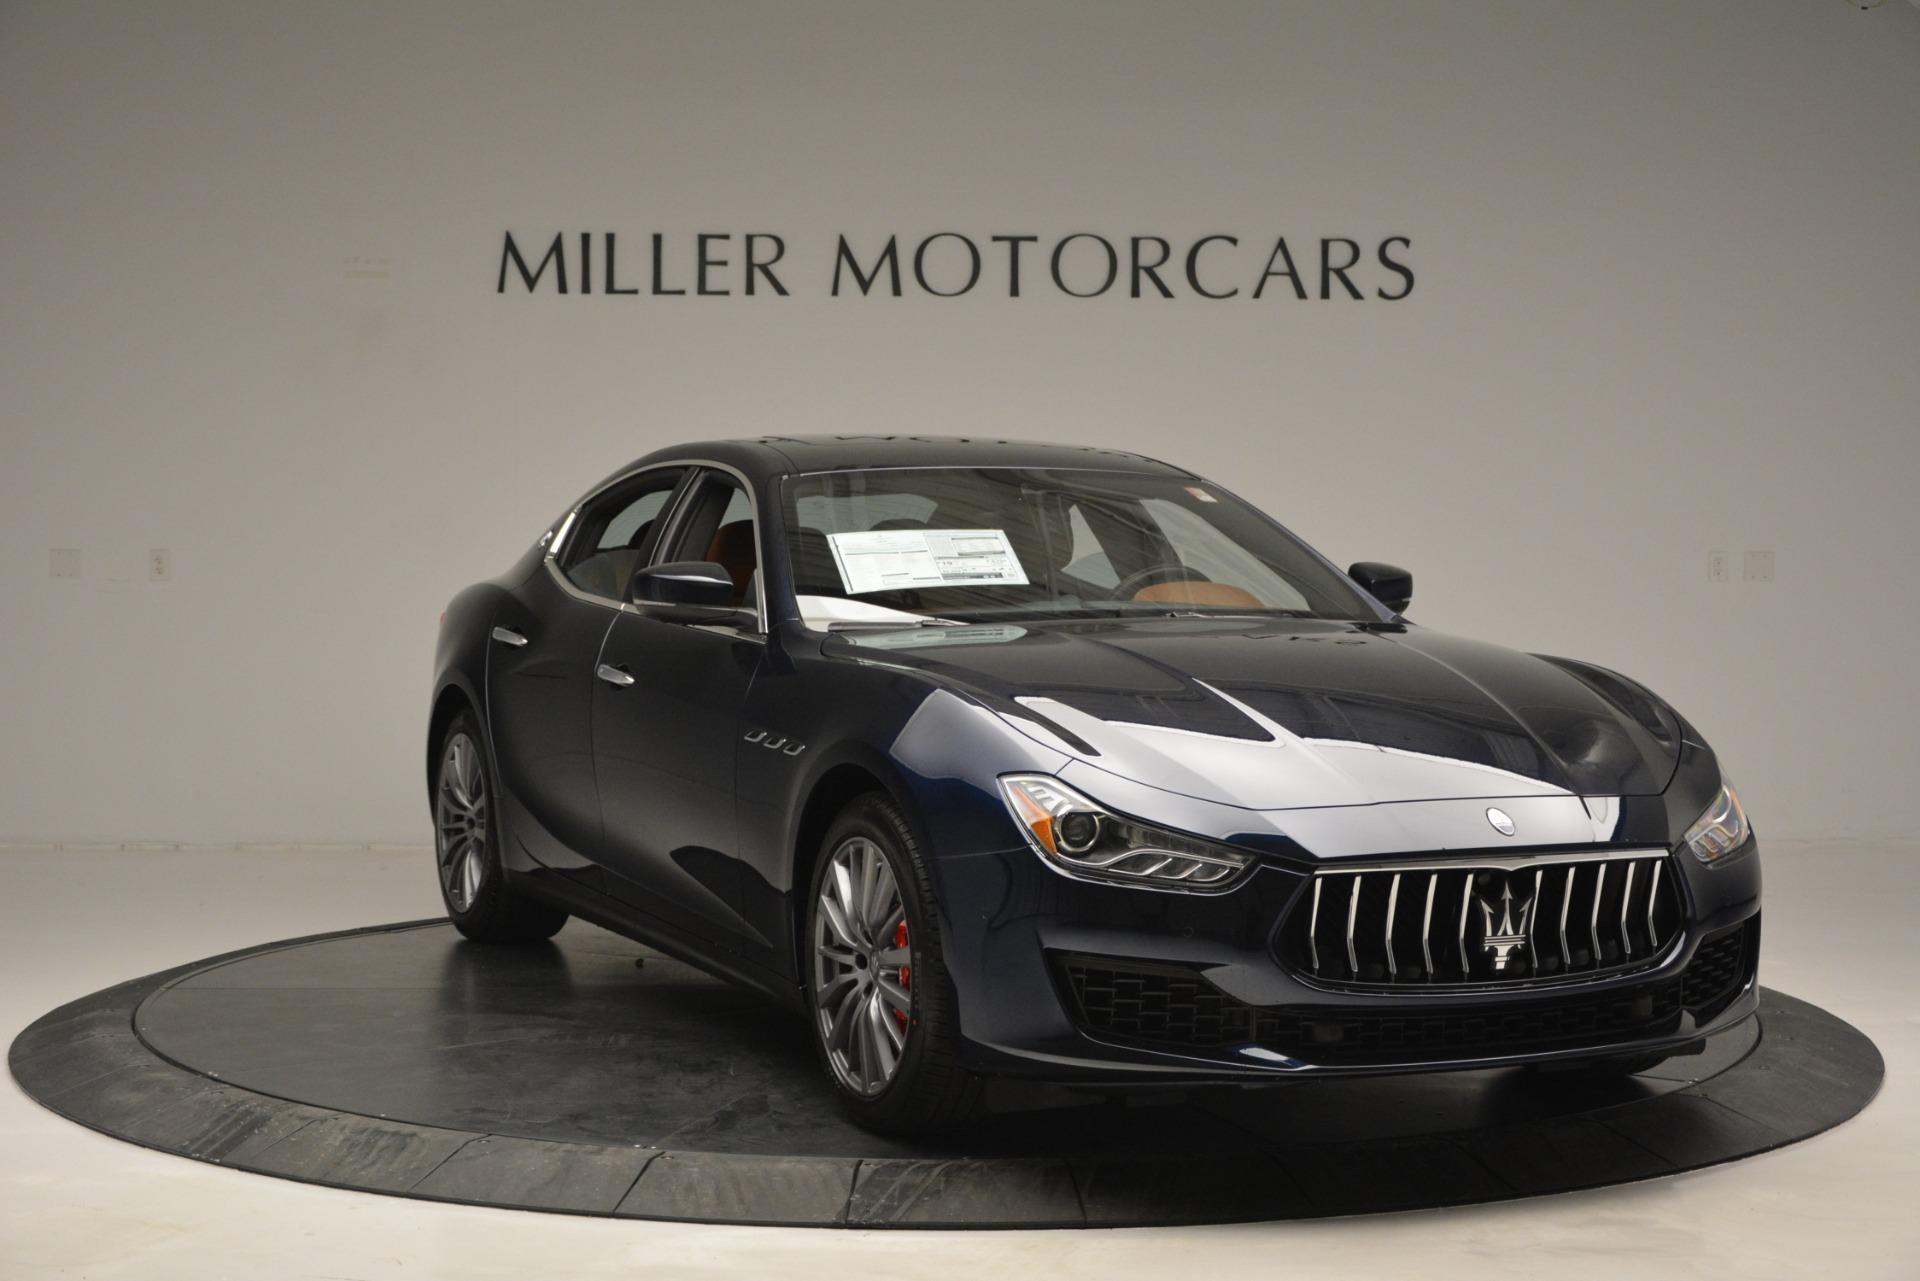 New 2019 Maserati Ghibli S Q4 For Sale In Westport, CT 2862_p11